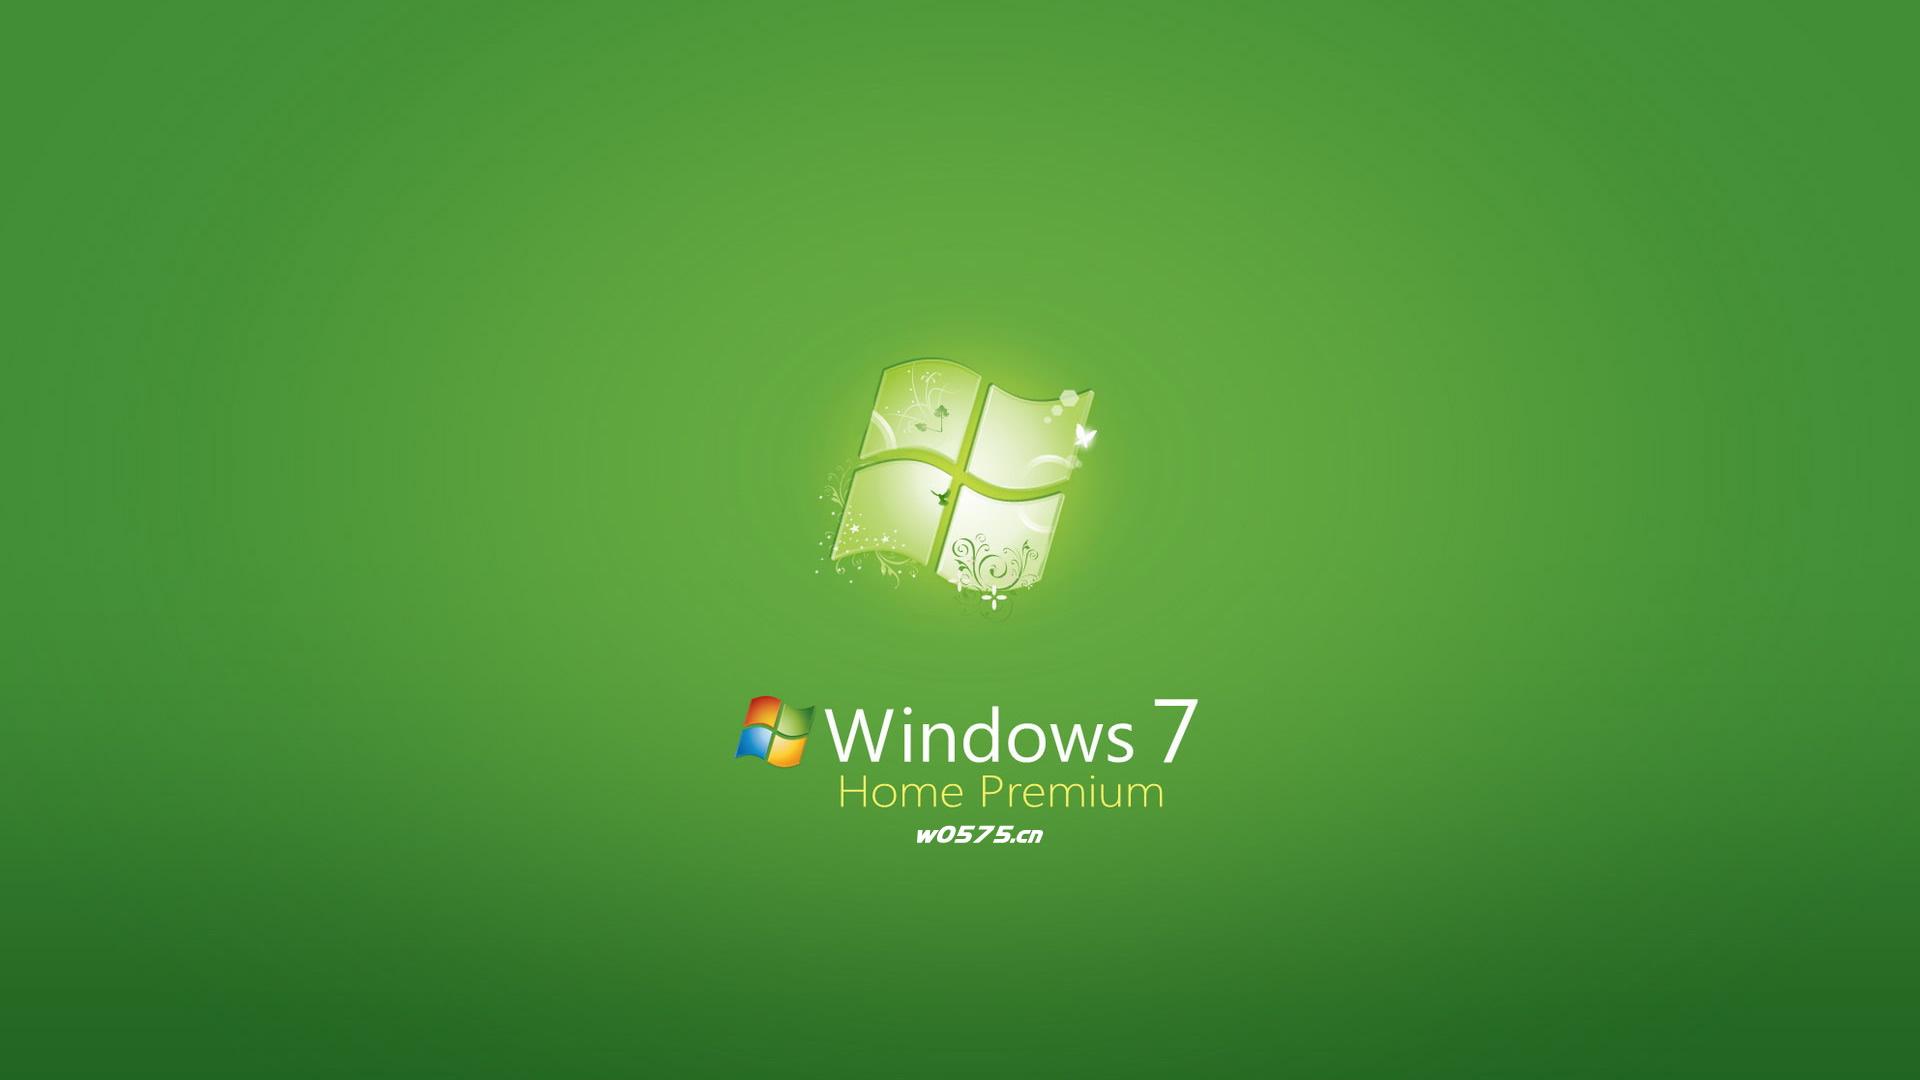 428043611_3d绿色护眼桌面壁纸》| 3d护眼 电脑 壁纸桌面 | 3d护 ...